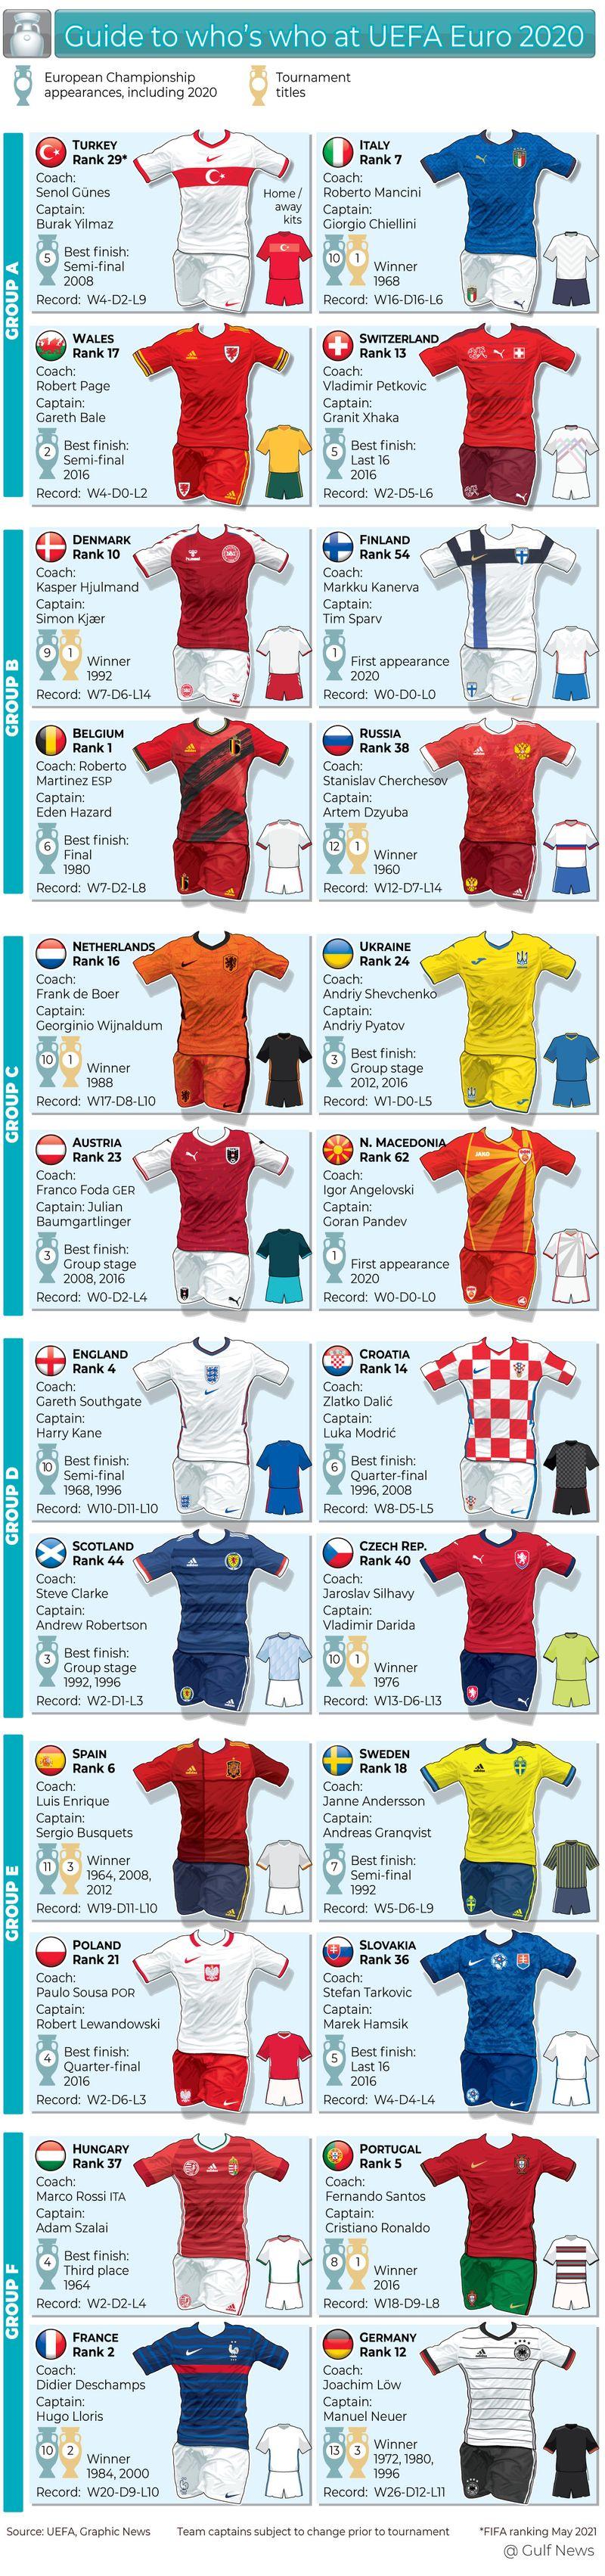 UEFA Euro 2020 team guide